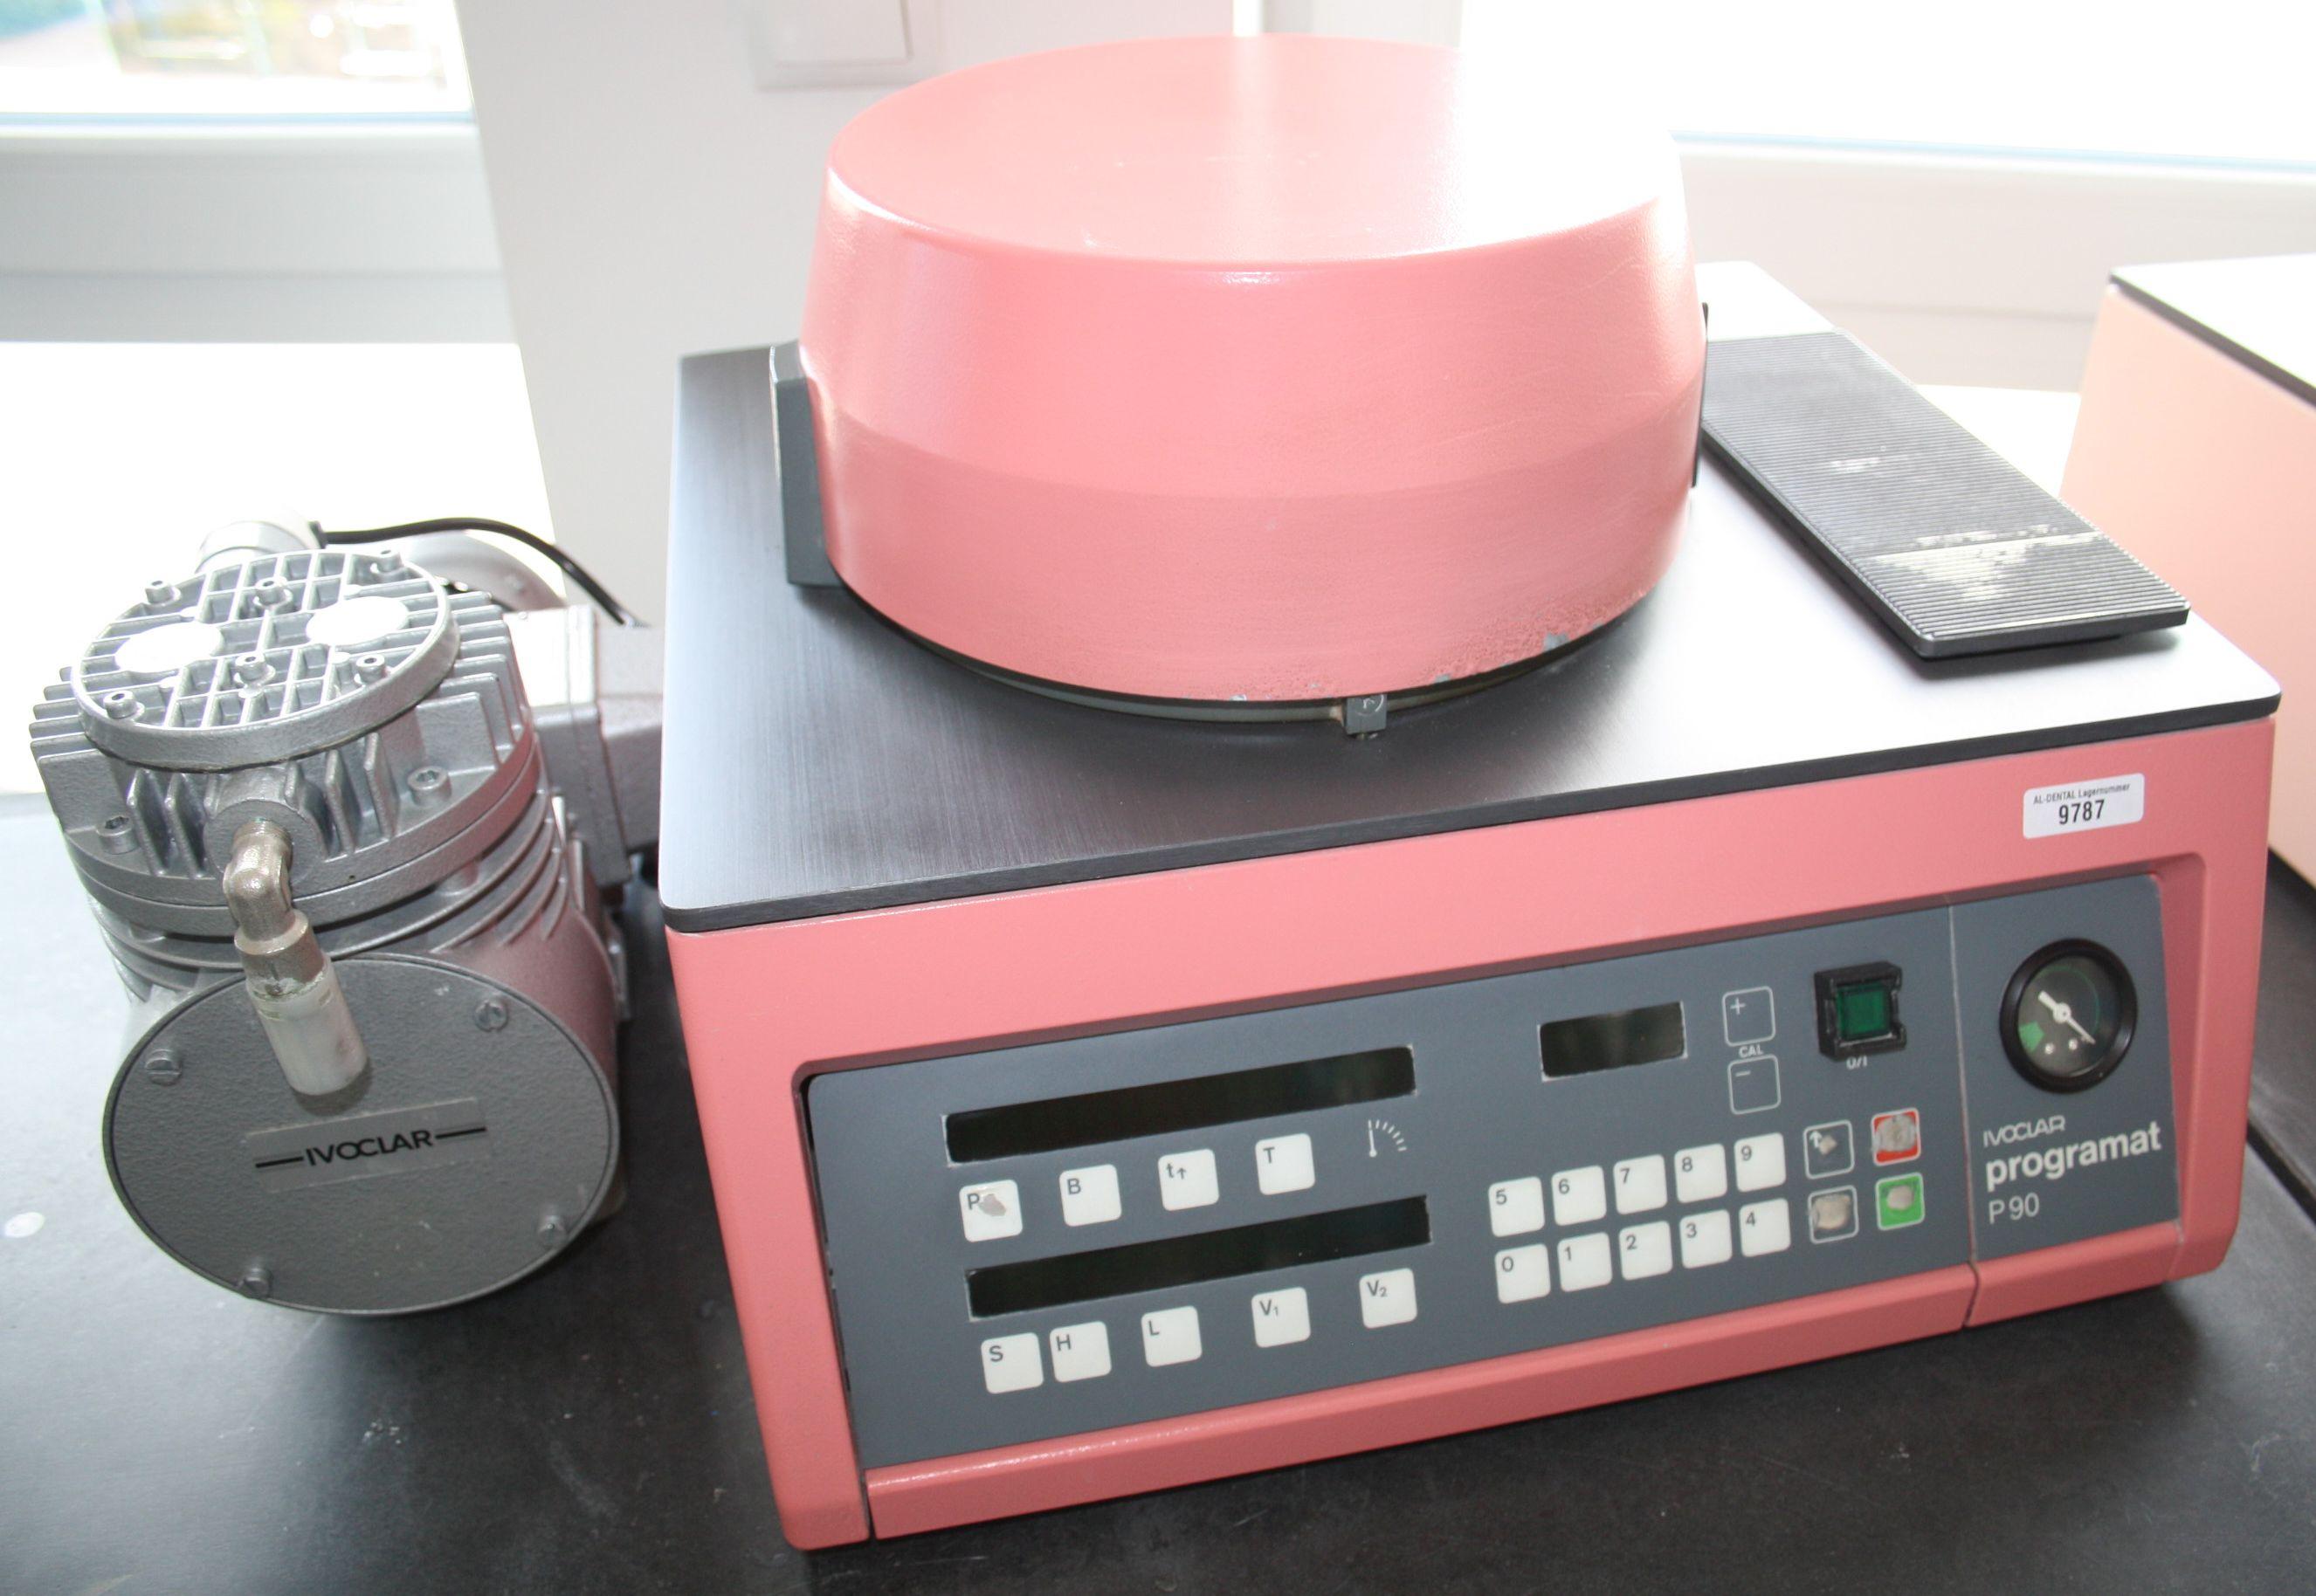 IVOCLAR Keramikofen Programat Typ P 90 + Vakuumpumpe # 9787